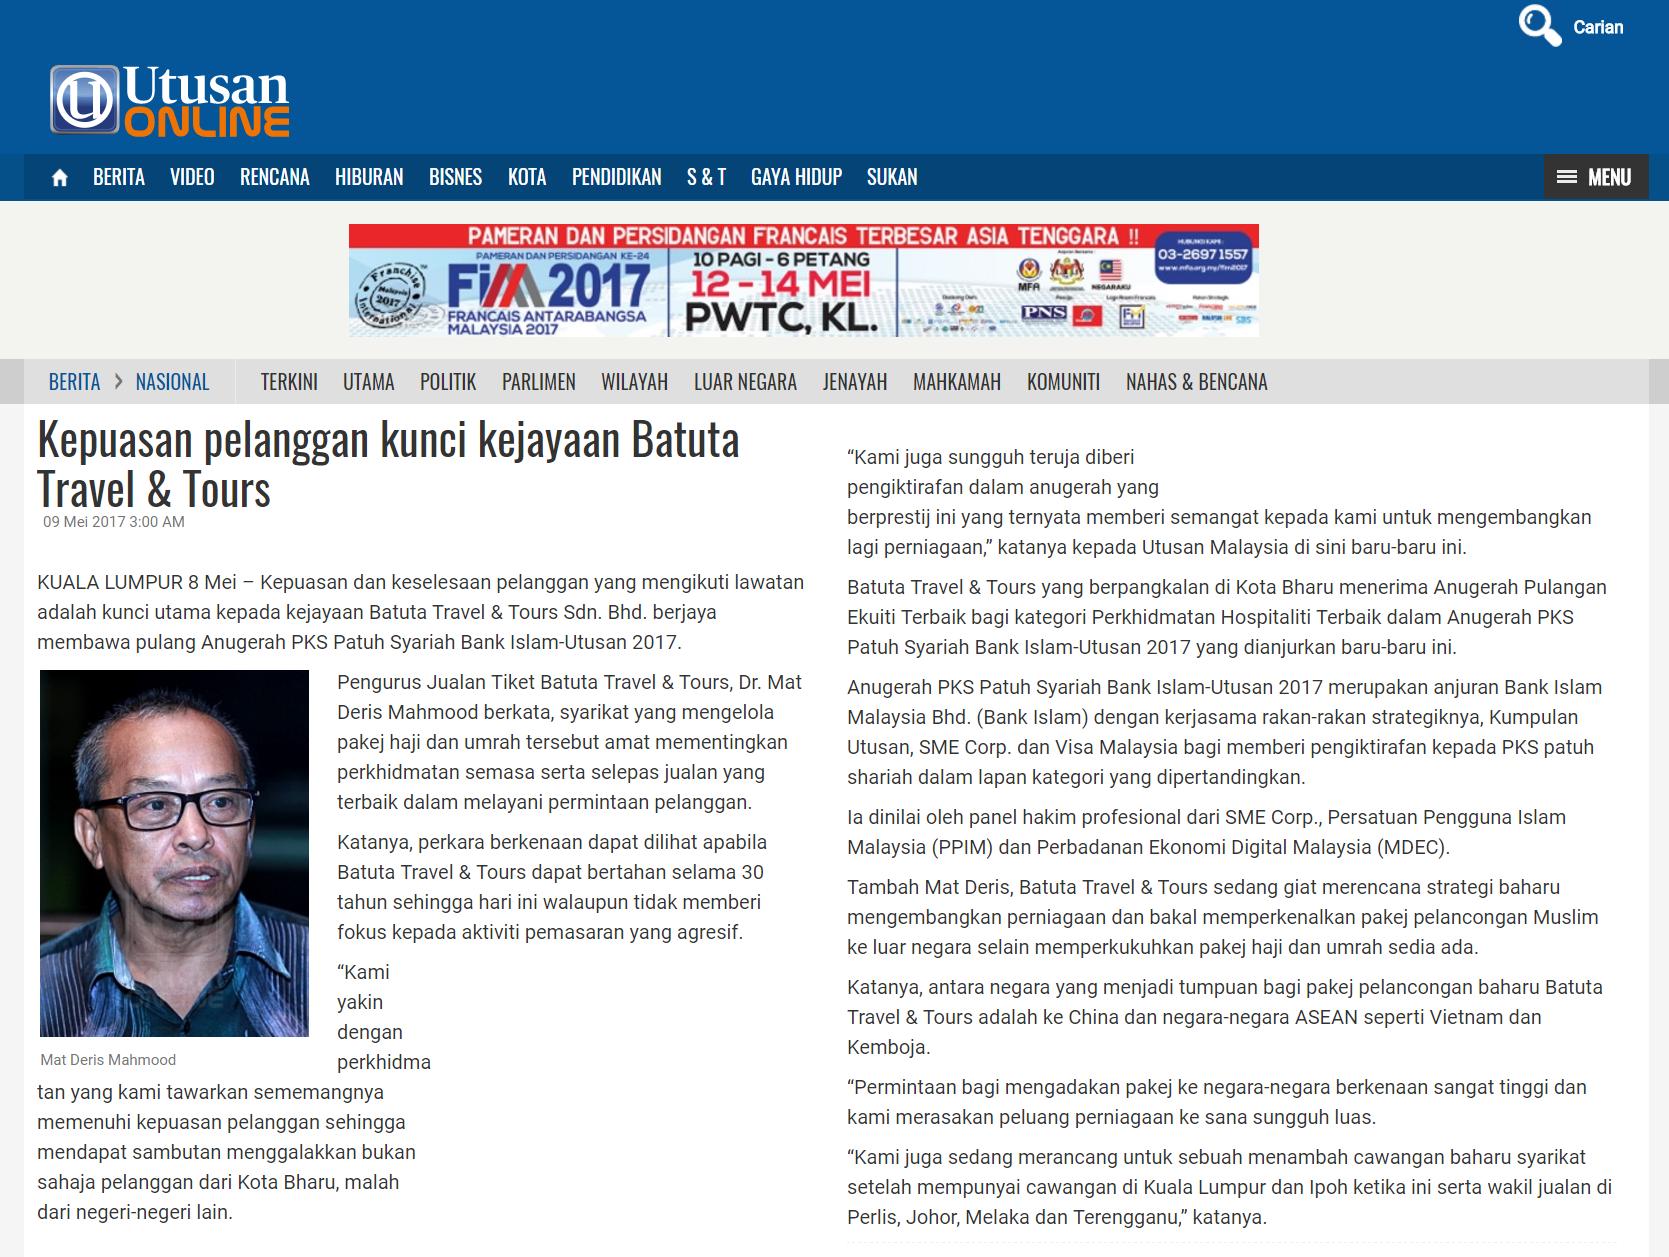 20170508 - Utusan Online - Ekonomi - Kepuasan pelanggan kunci kejayaan Batuta Travel & Tours